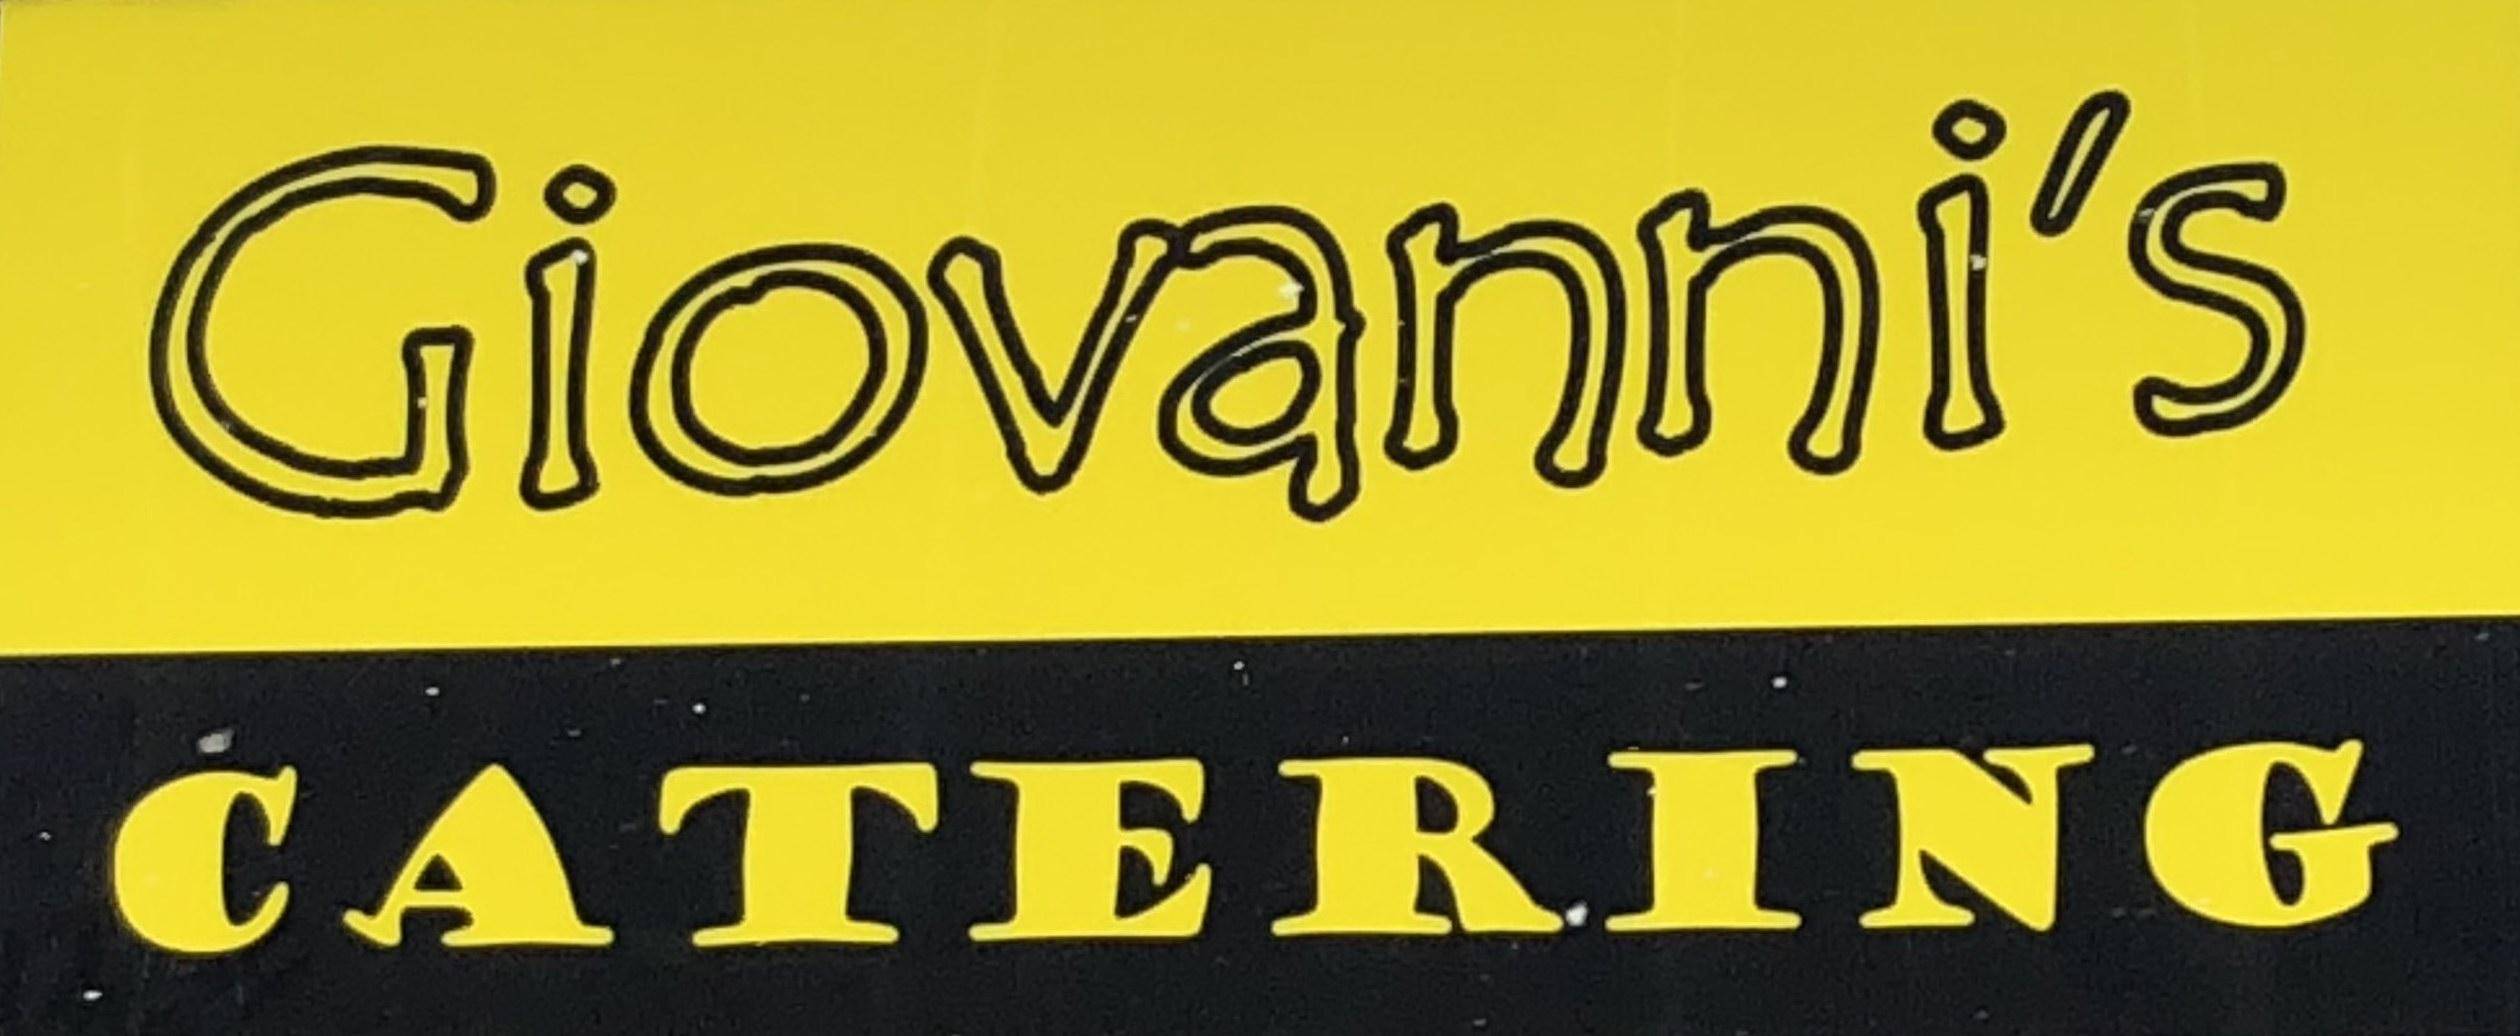 Giovanni's Catering Logo